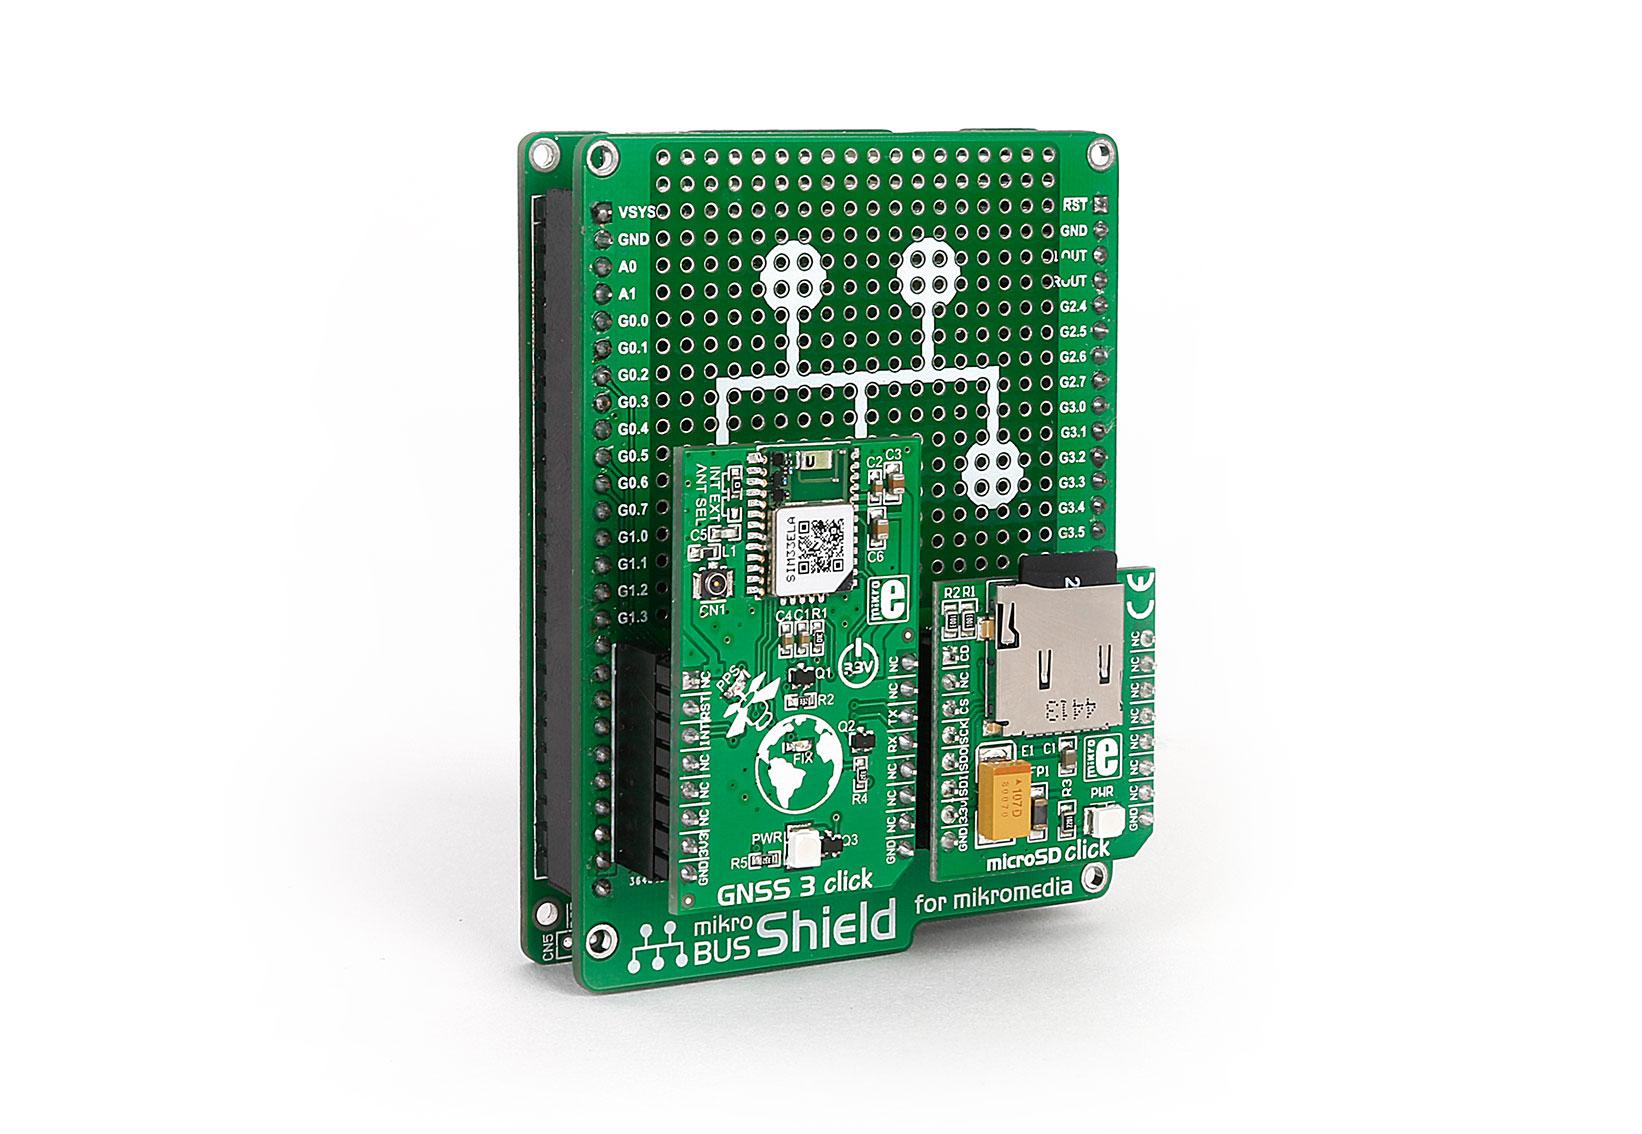 mikromedia Shields